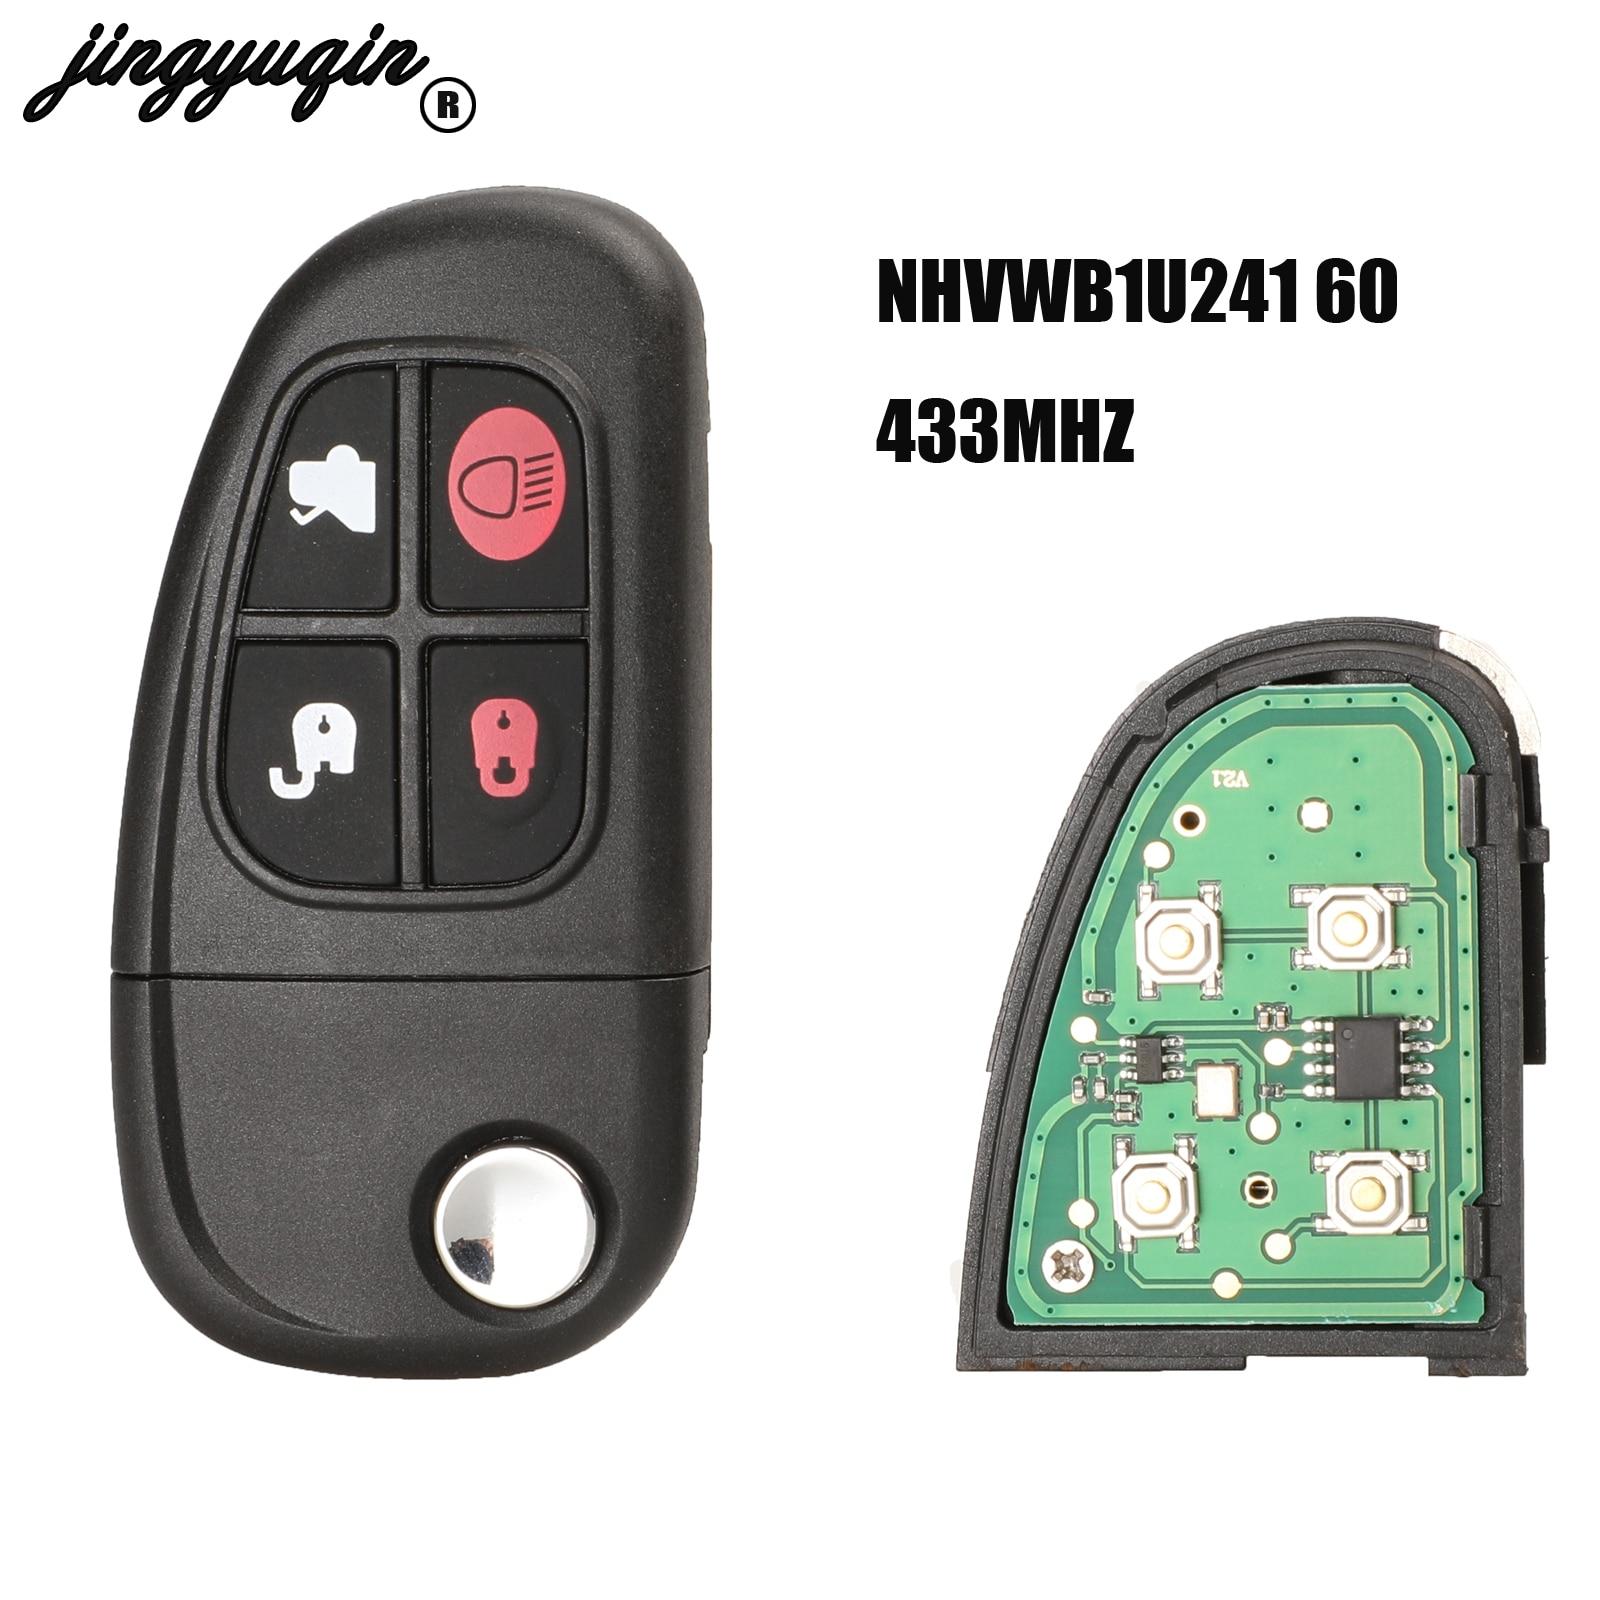 jingyuqin 4 Buttons Flip 2002-2008 433mhz 4D60 Chip Remote Control Car Key Replacement For Jaguar X-Type S-Type 1999-2009 XJ XJR